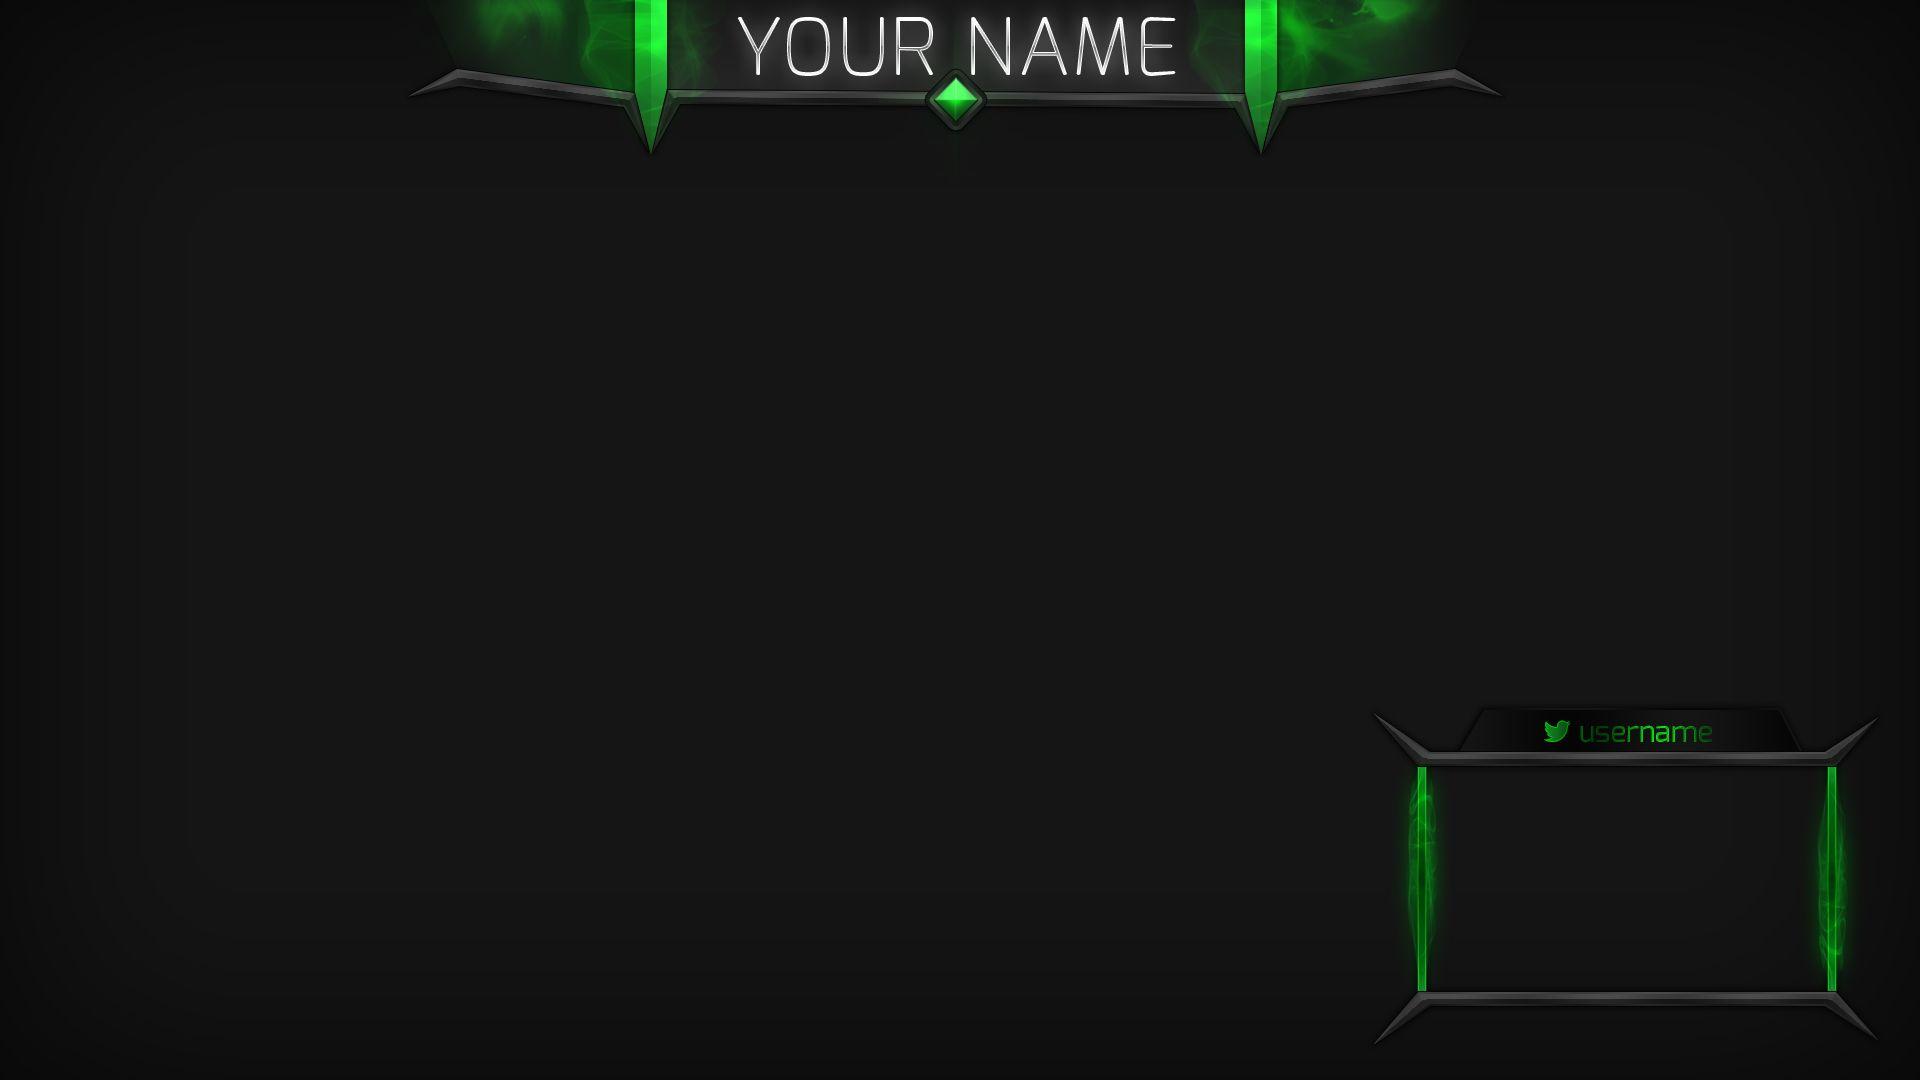 Poison+Cloud+Green+Stream+Overlay+Twitch | Stream Board